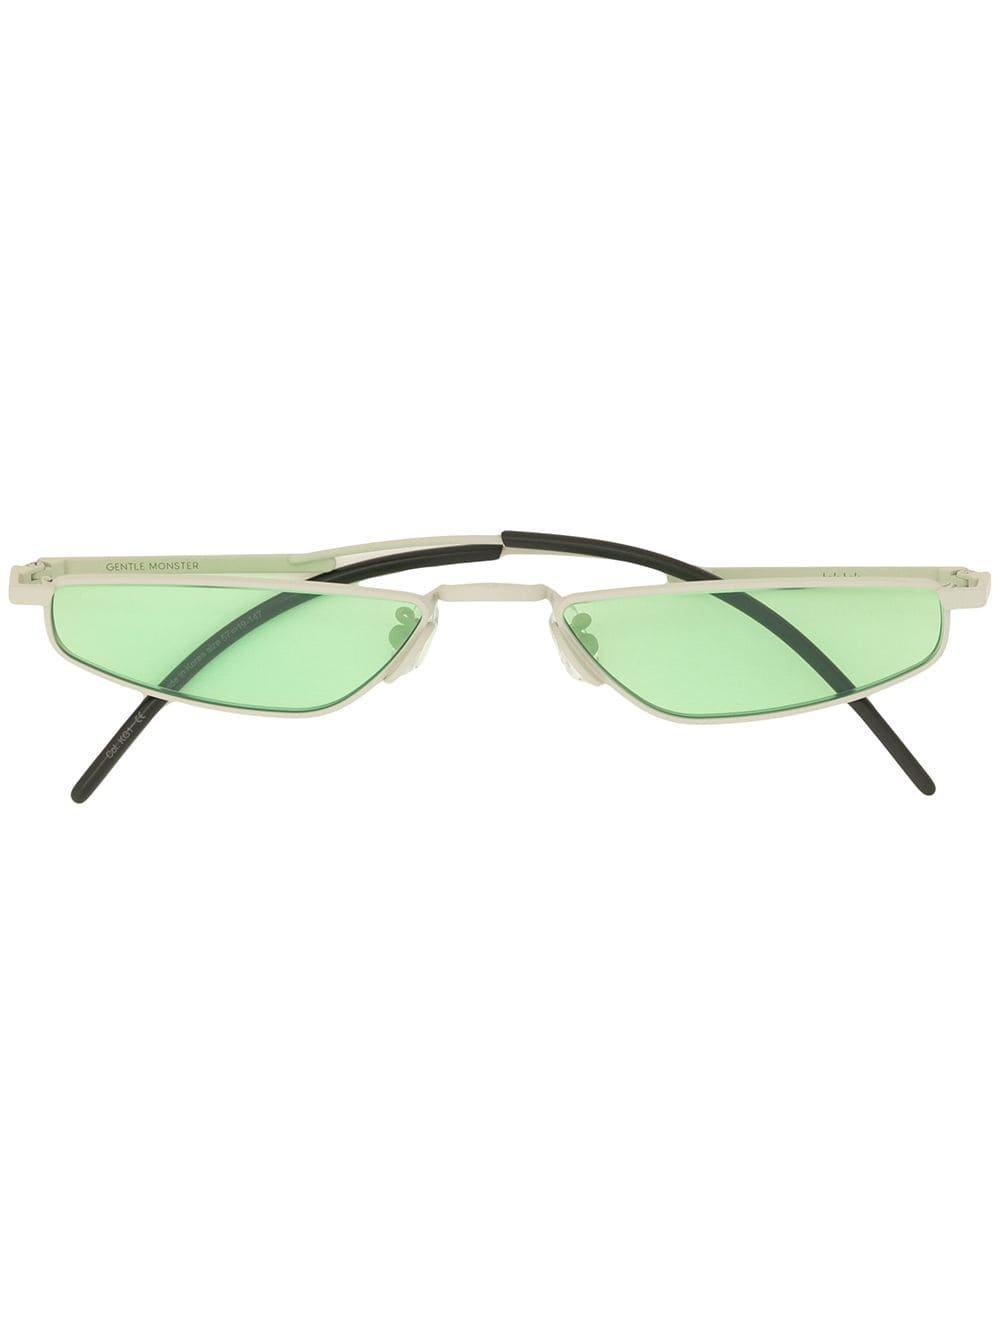 Gentle Monster Halo Halo Sunglasses